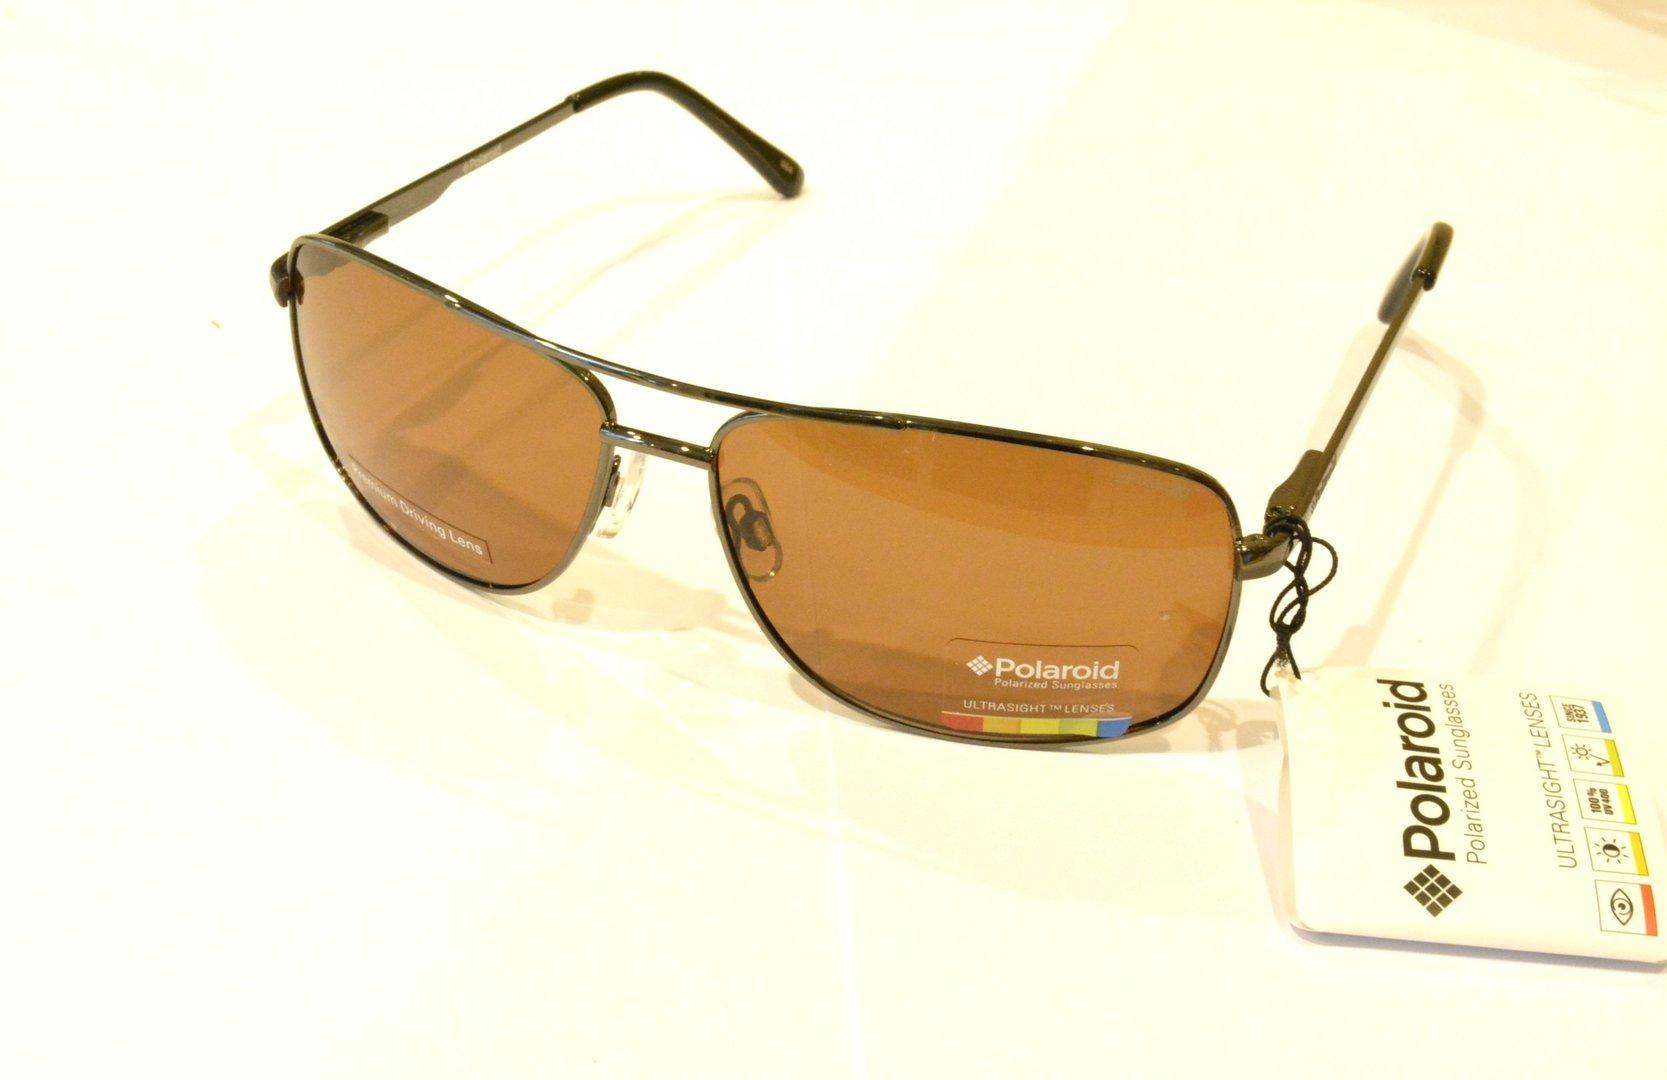 Sunglasses Polaroid P4409 A BC5 GREY POLARIZED OTTICA TRAINA 2b14a305c9